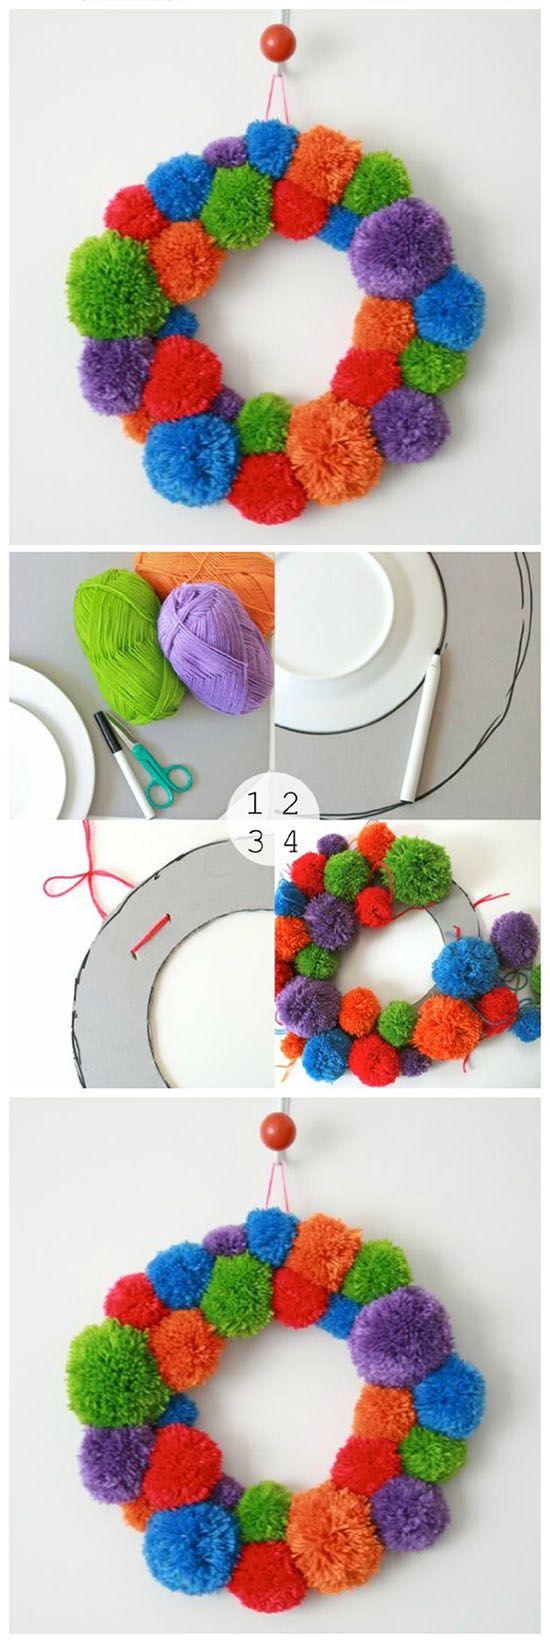 So Beautiful | DIY & Crafts